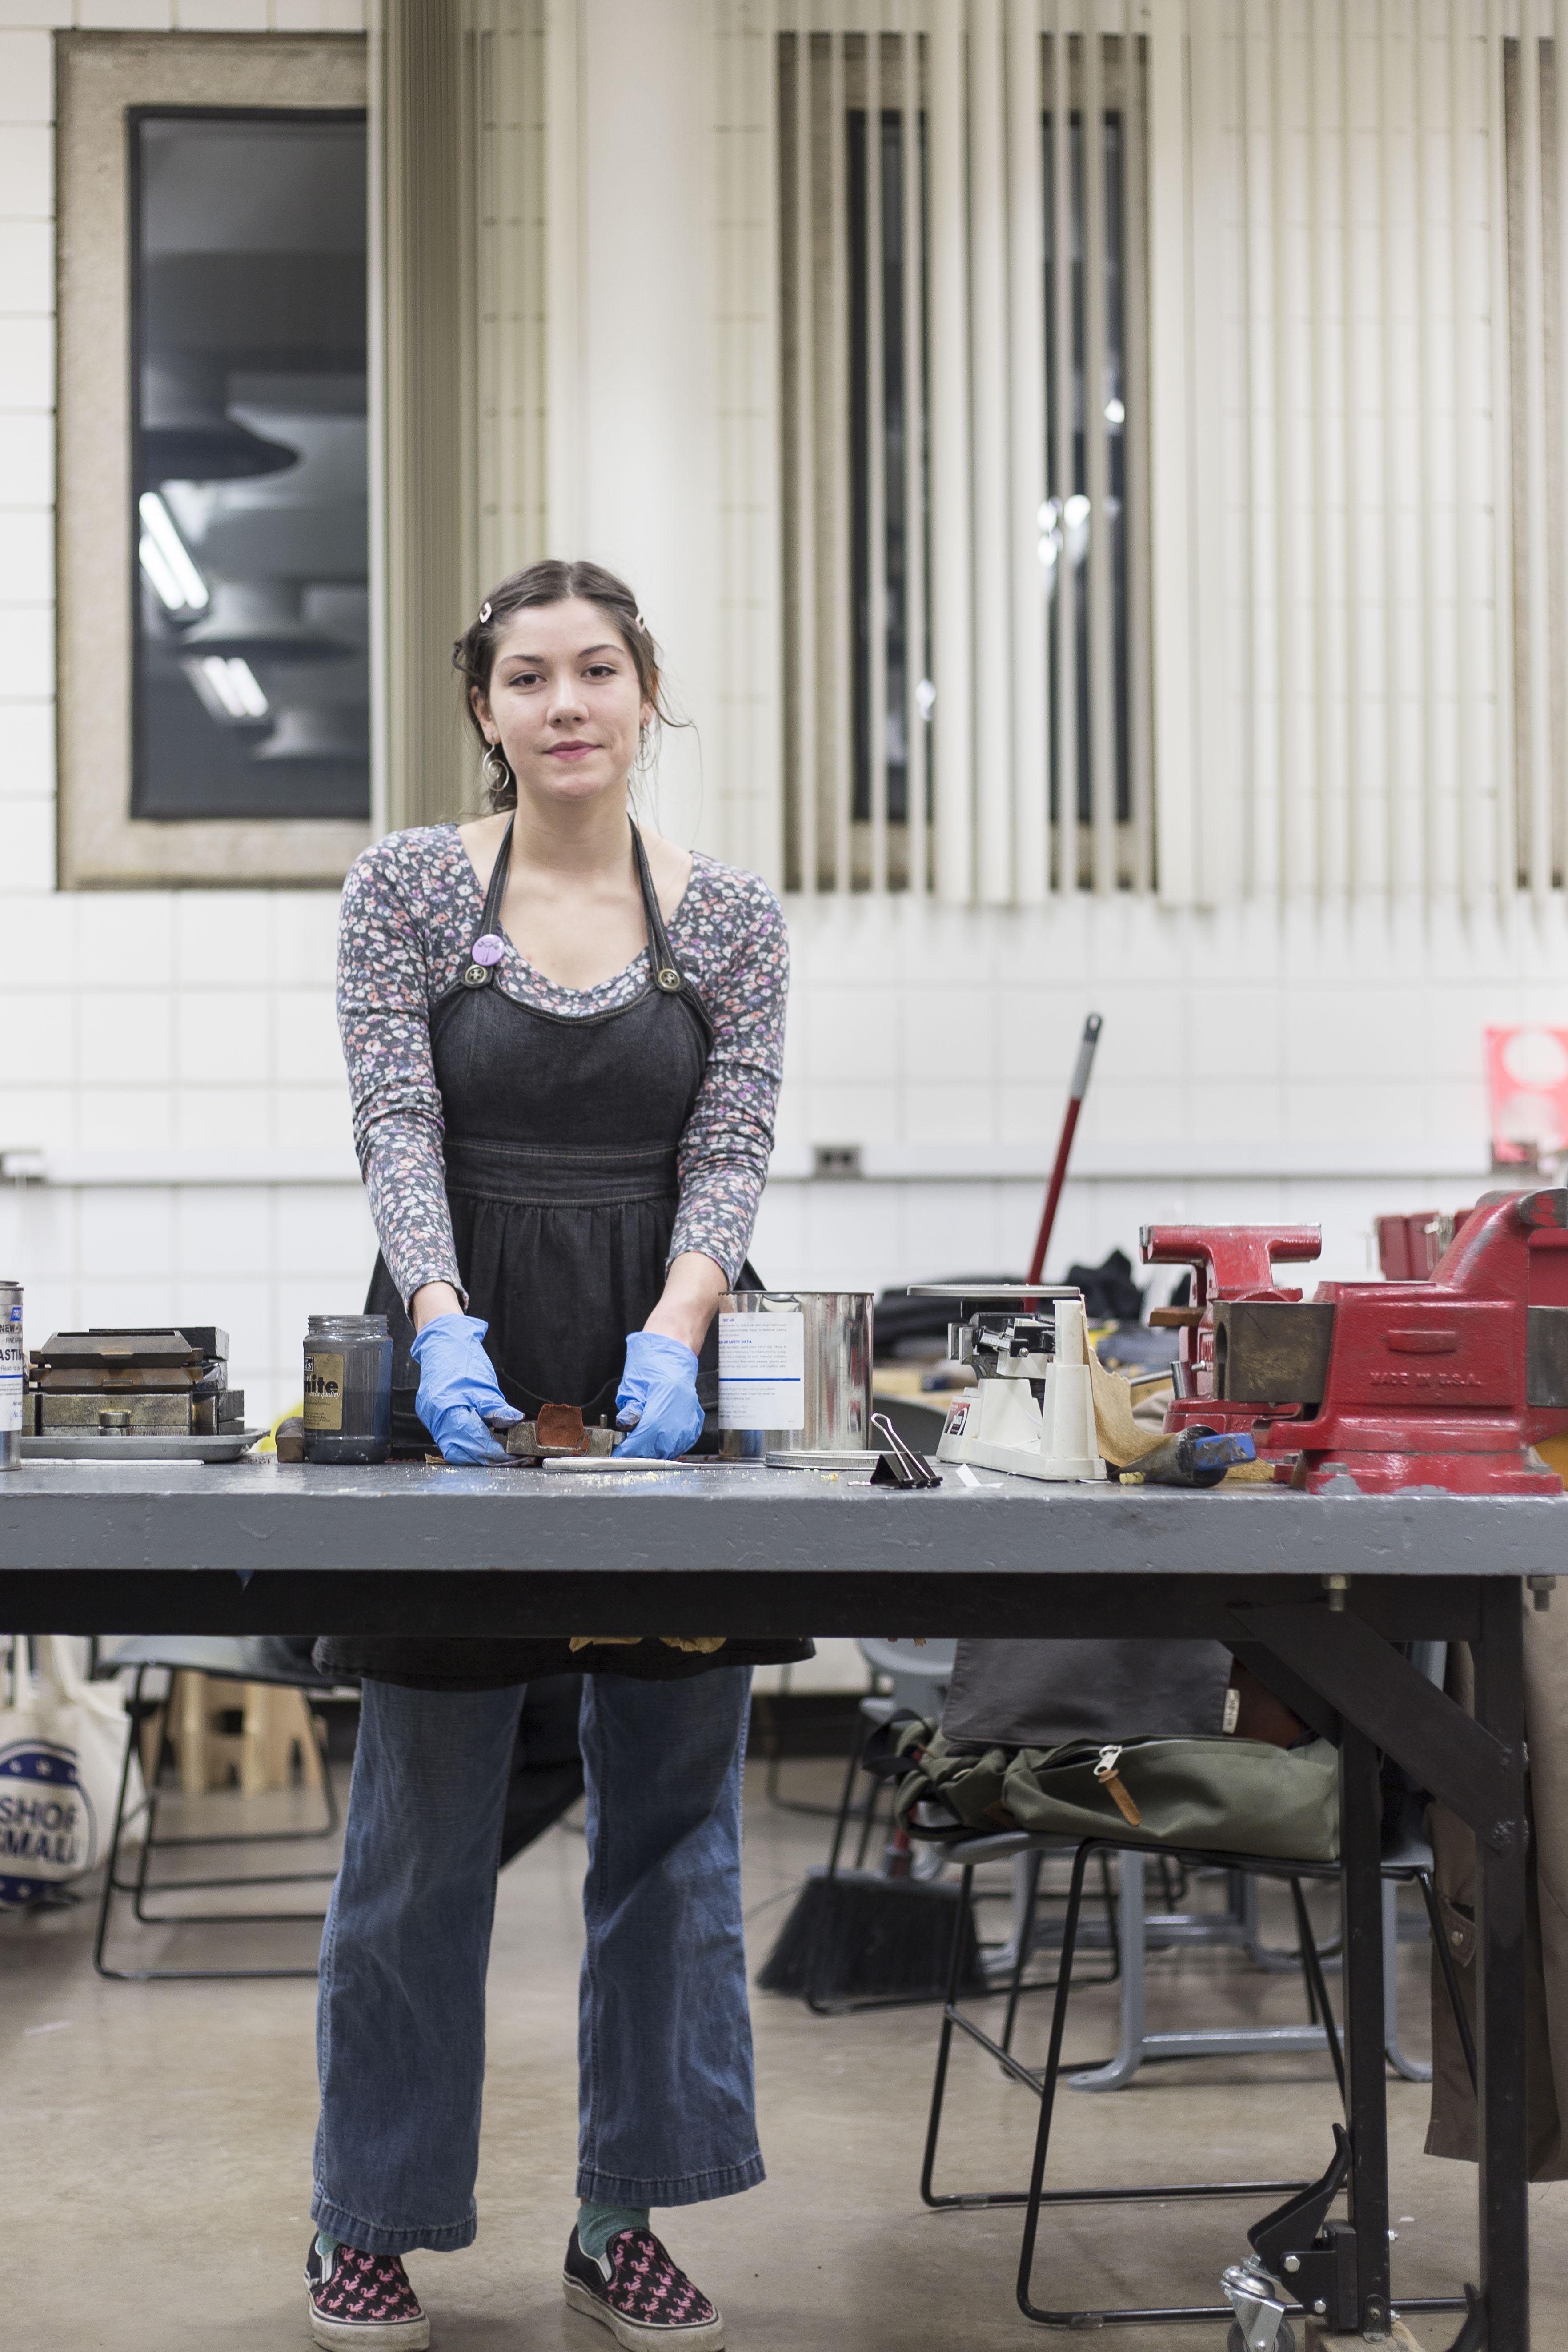 Sarah O'Heron working in Metals Lab